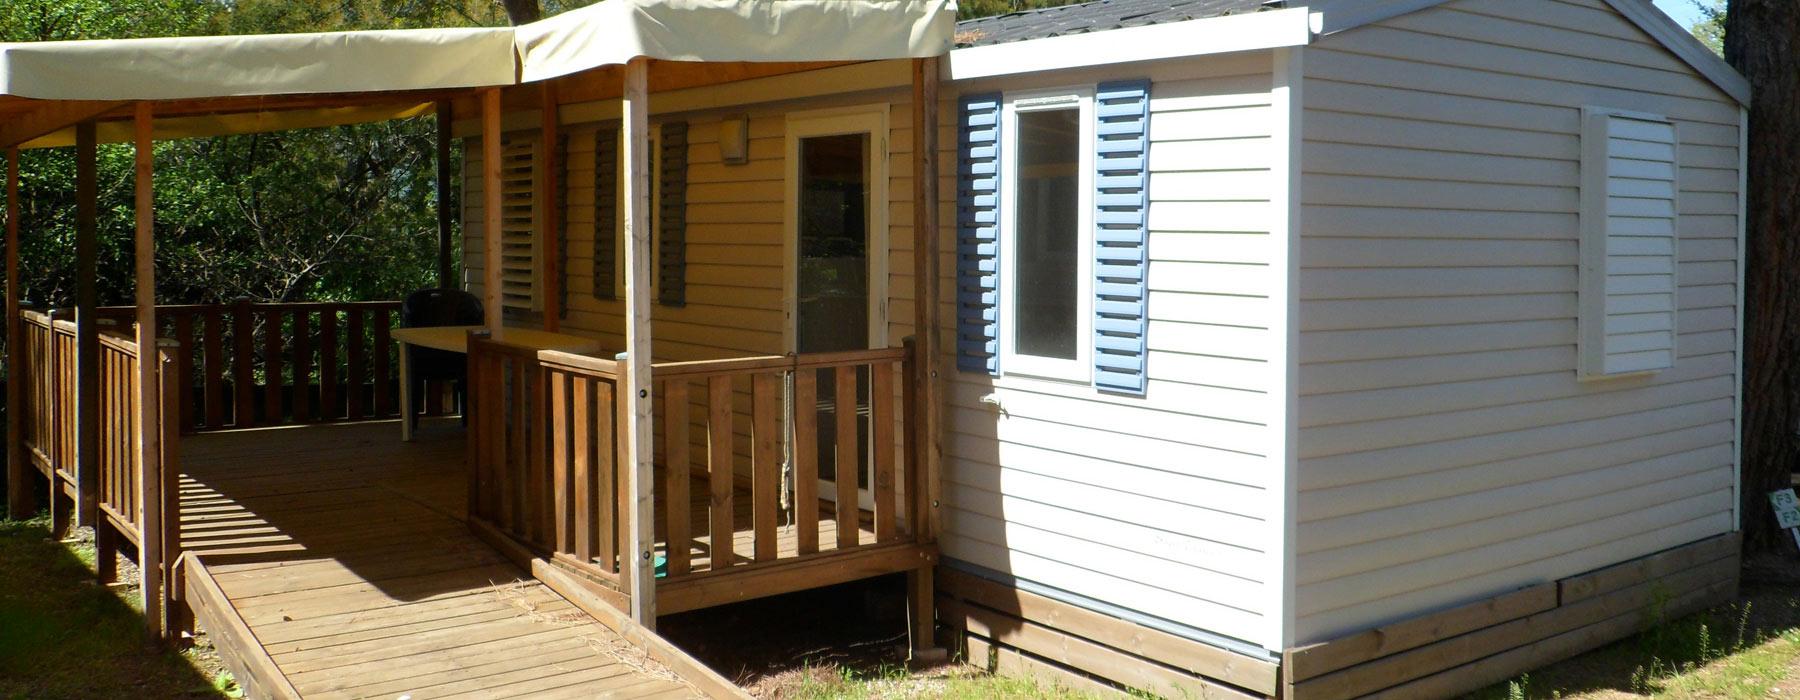 location mobil home pmr Pyrénées Orientales